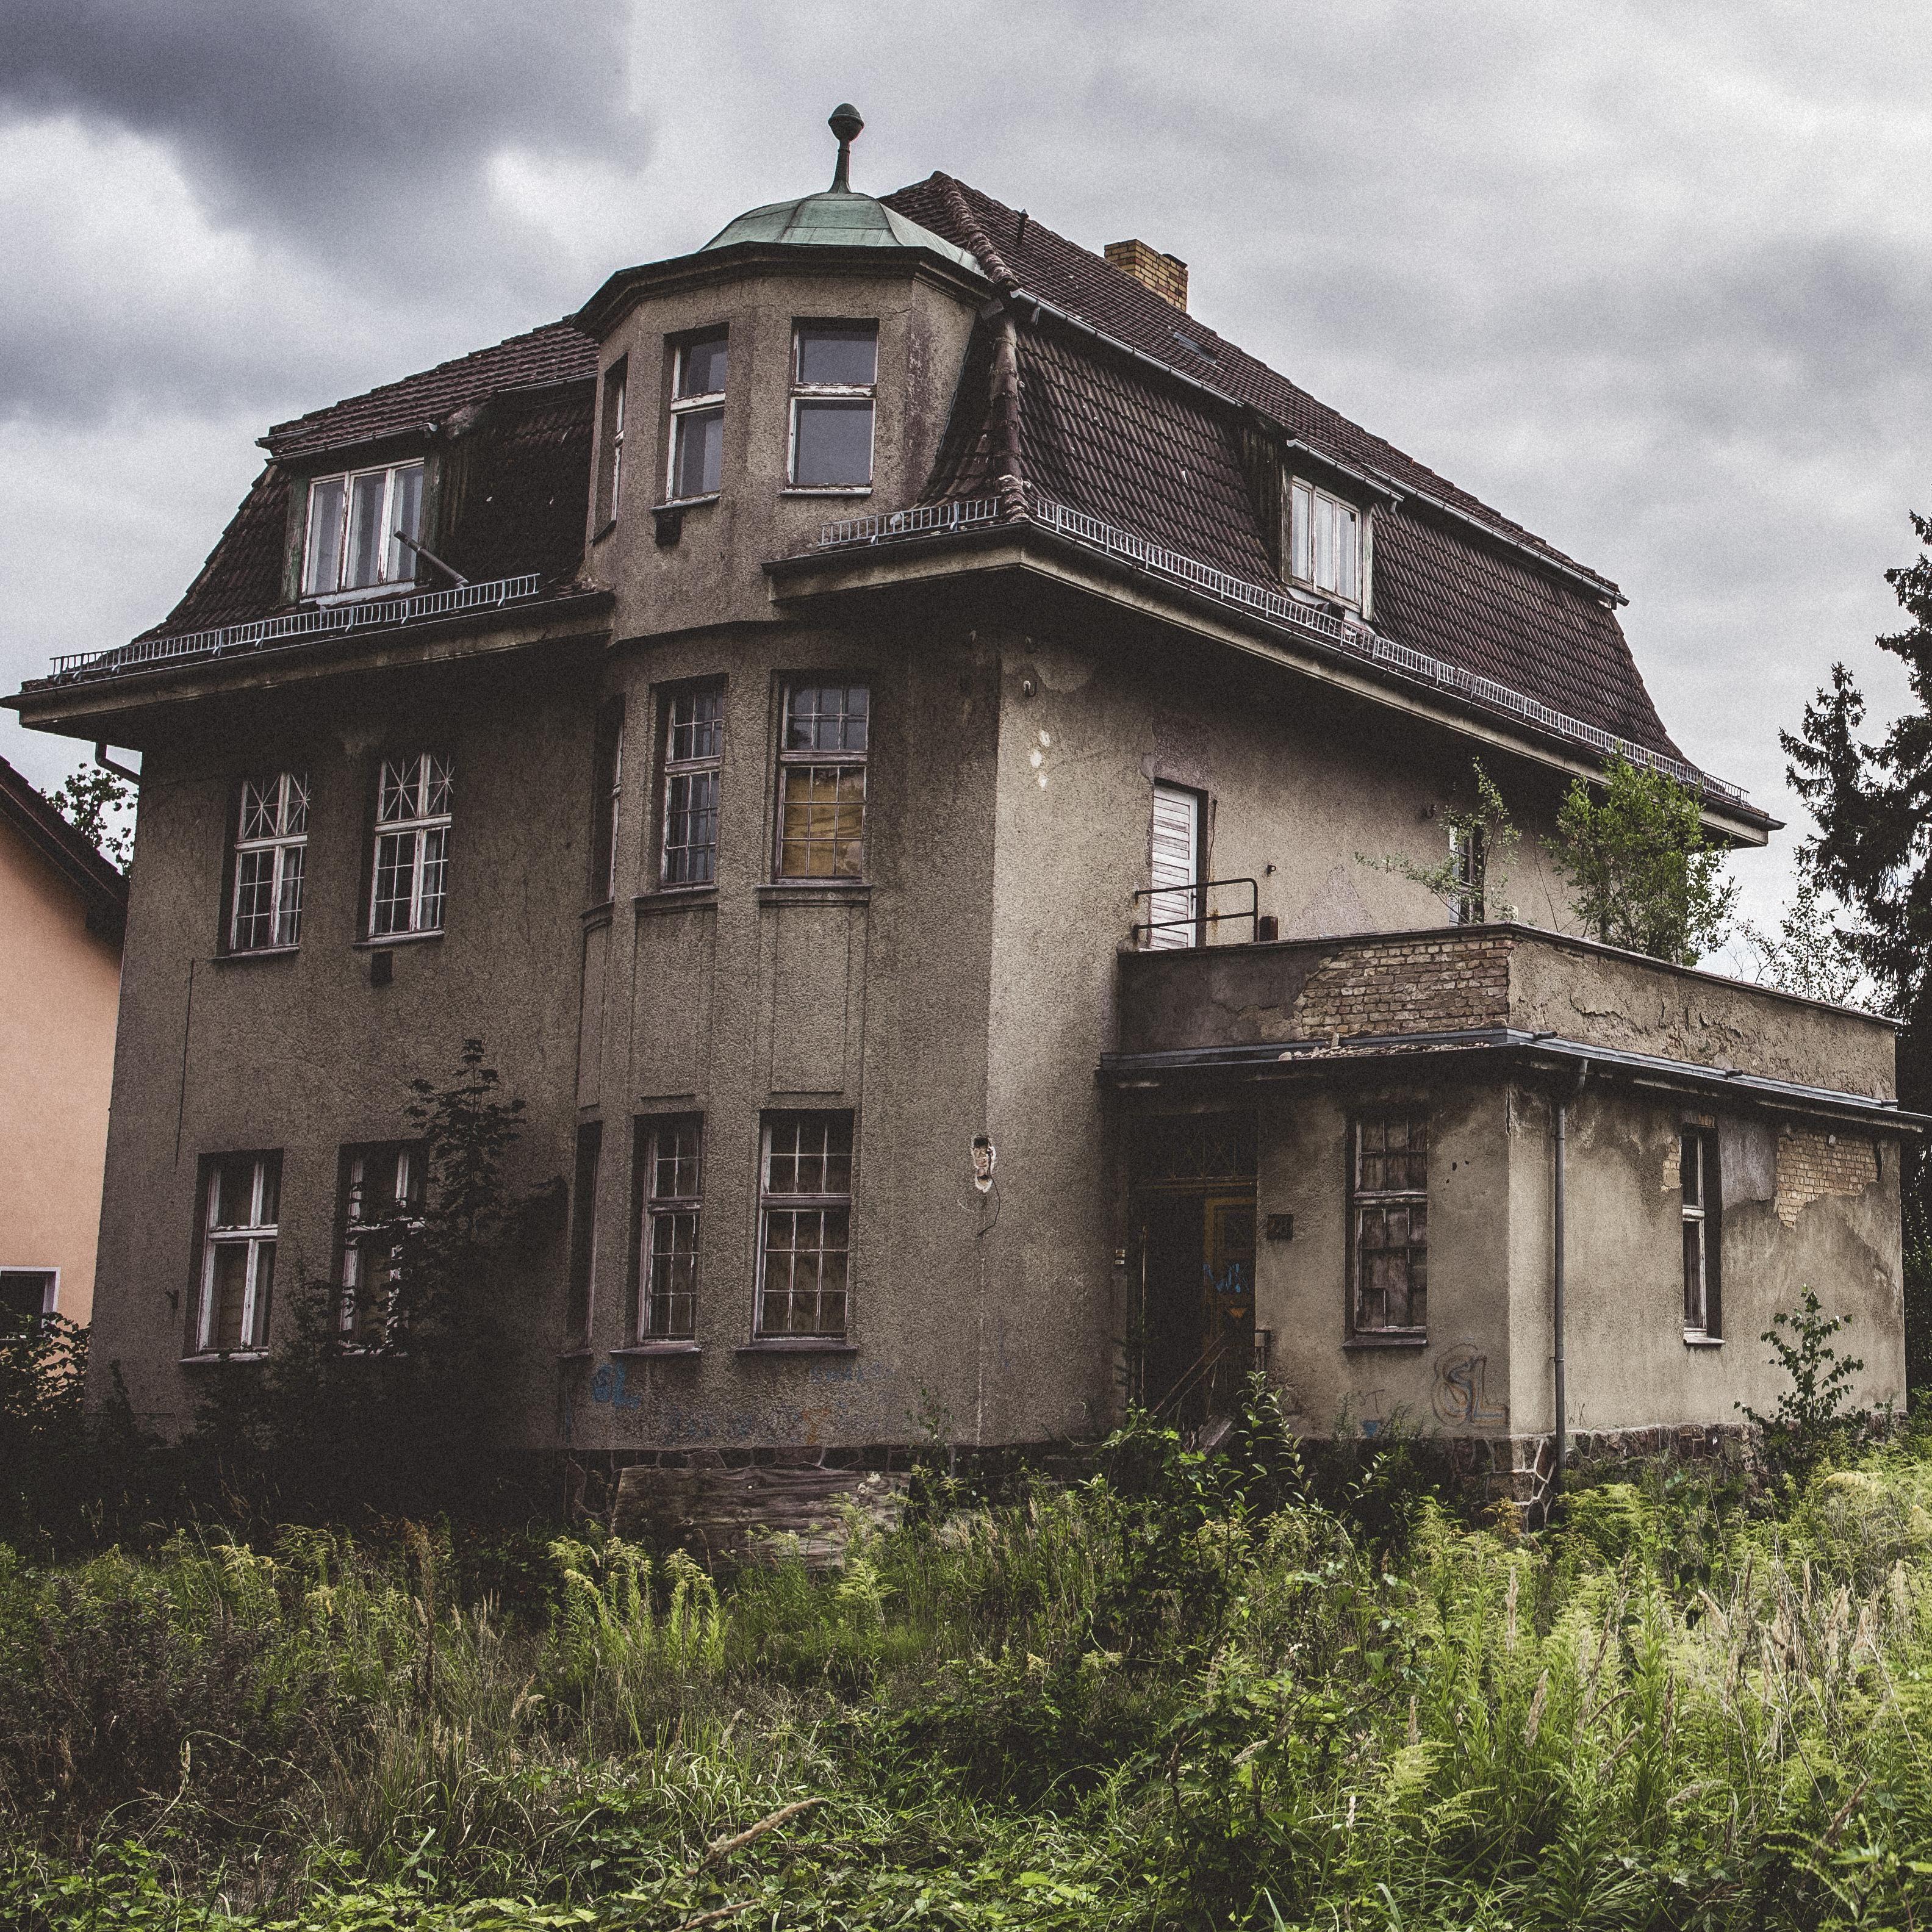 Abandoned Domicile In Waren Germany [OC] [3176x3176]